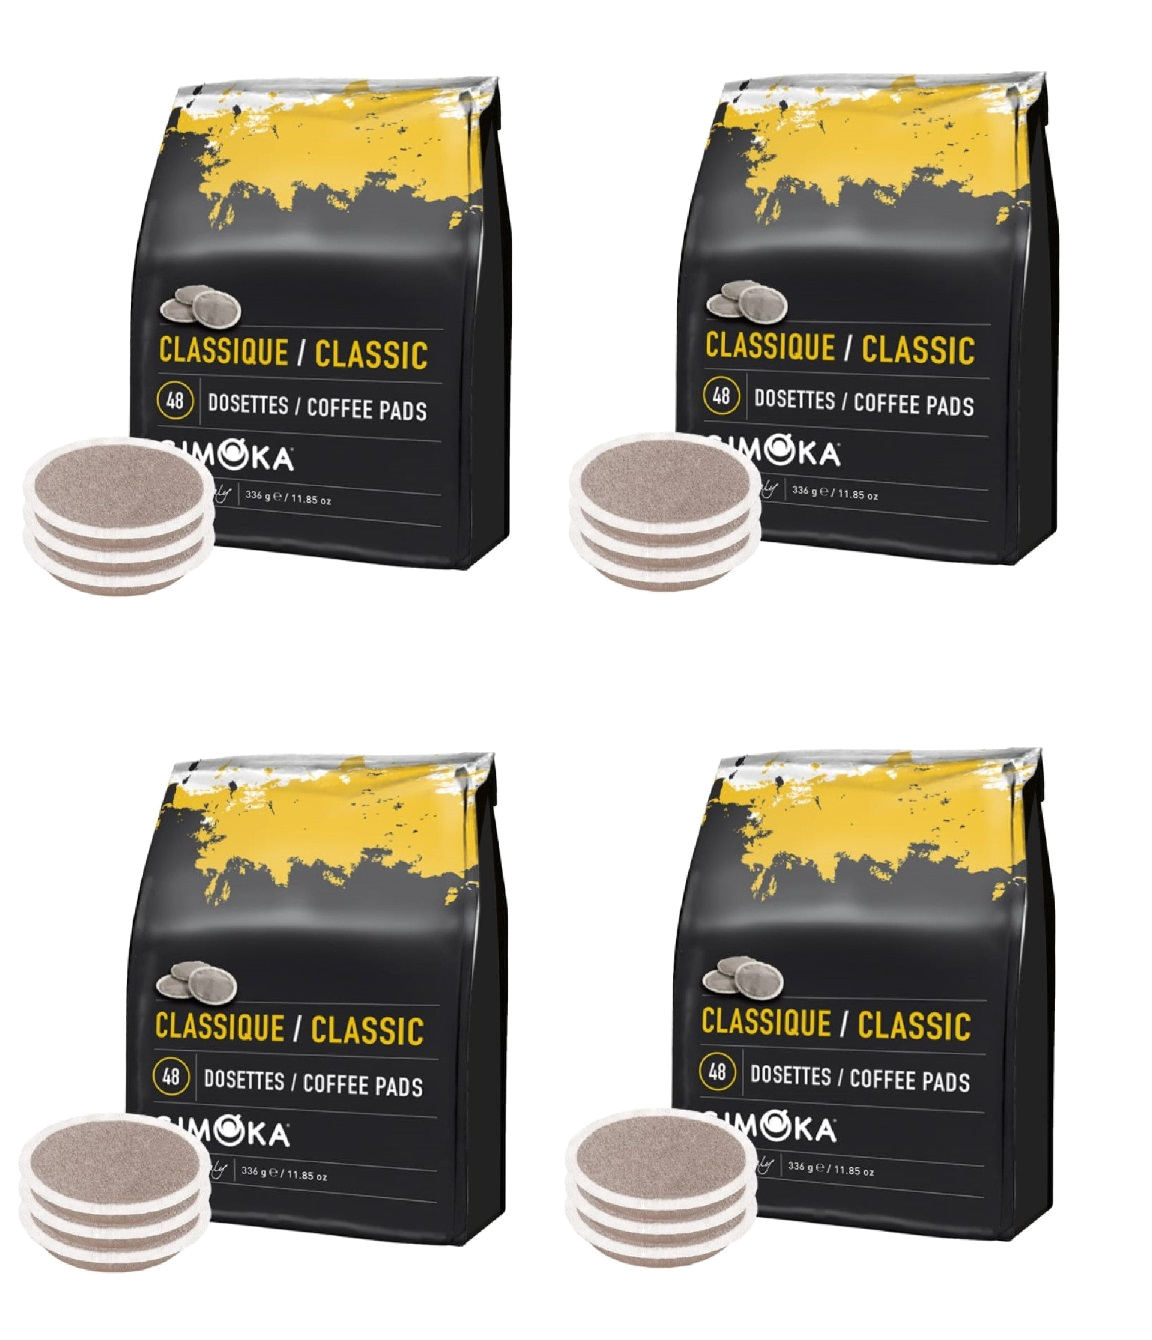 4 x 48 Gimoka Classic - Coffee Pads for Philips Senseo®